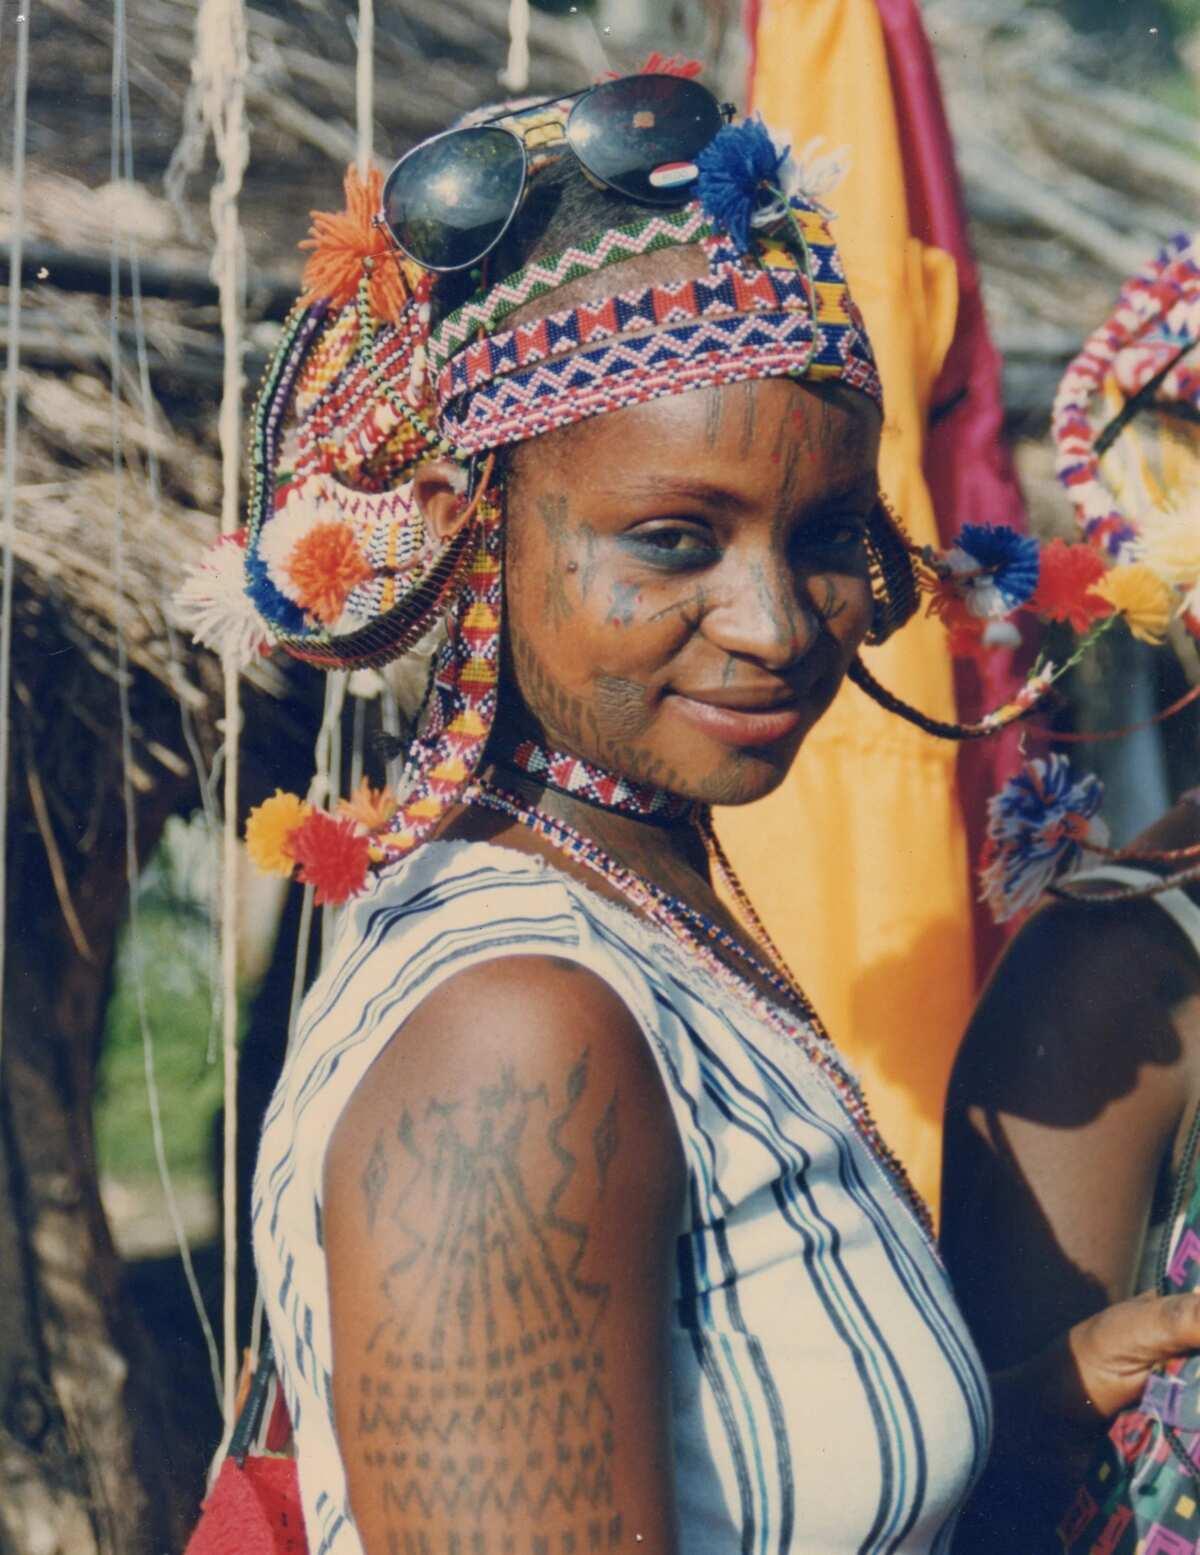 Fulani dressing